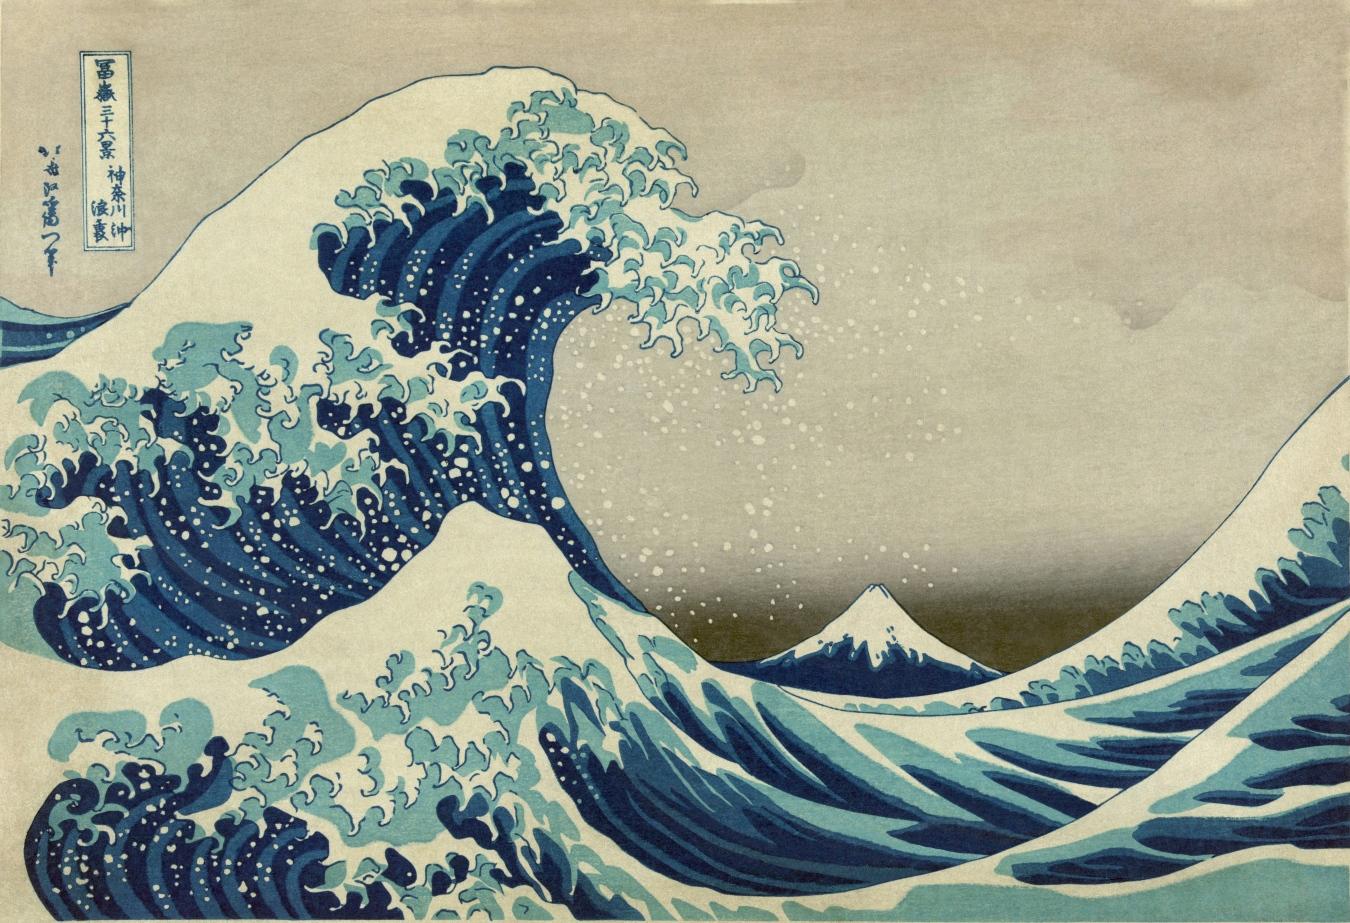 """La gran ola de Kanagawa"" de Katsushika Hokusai - TIENDA - Tienda David Bokeh"